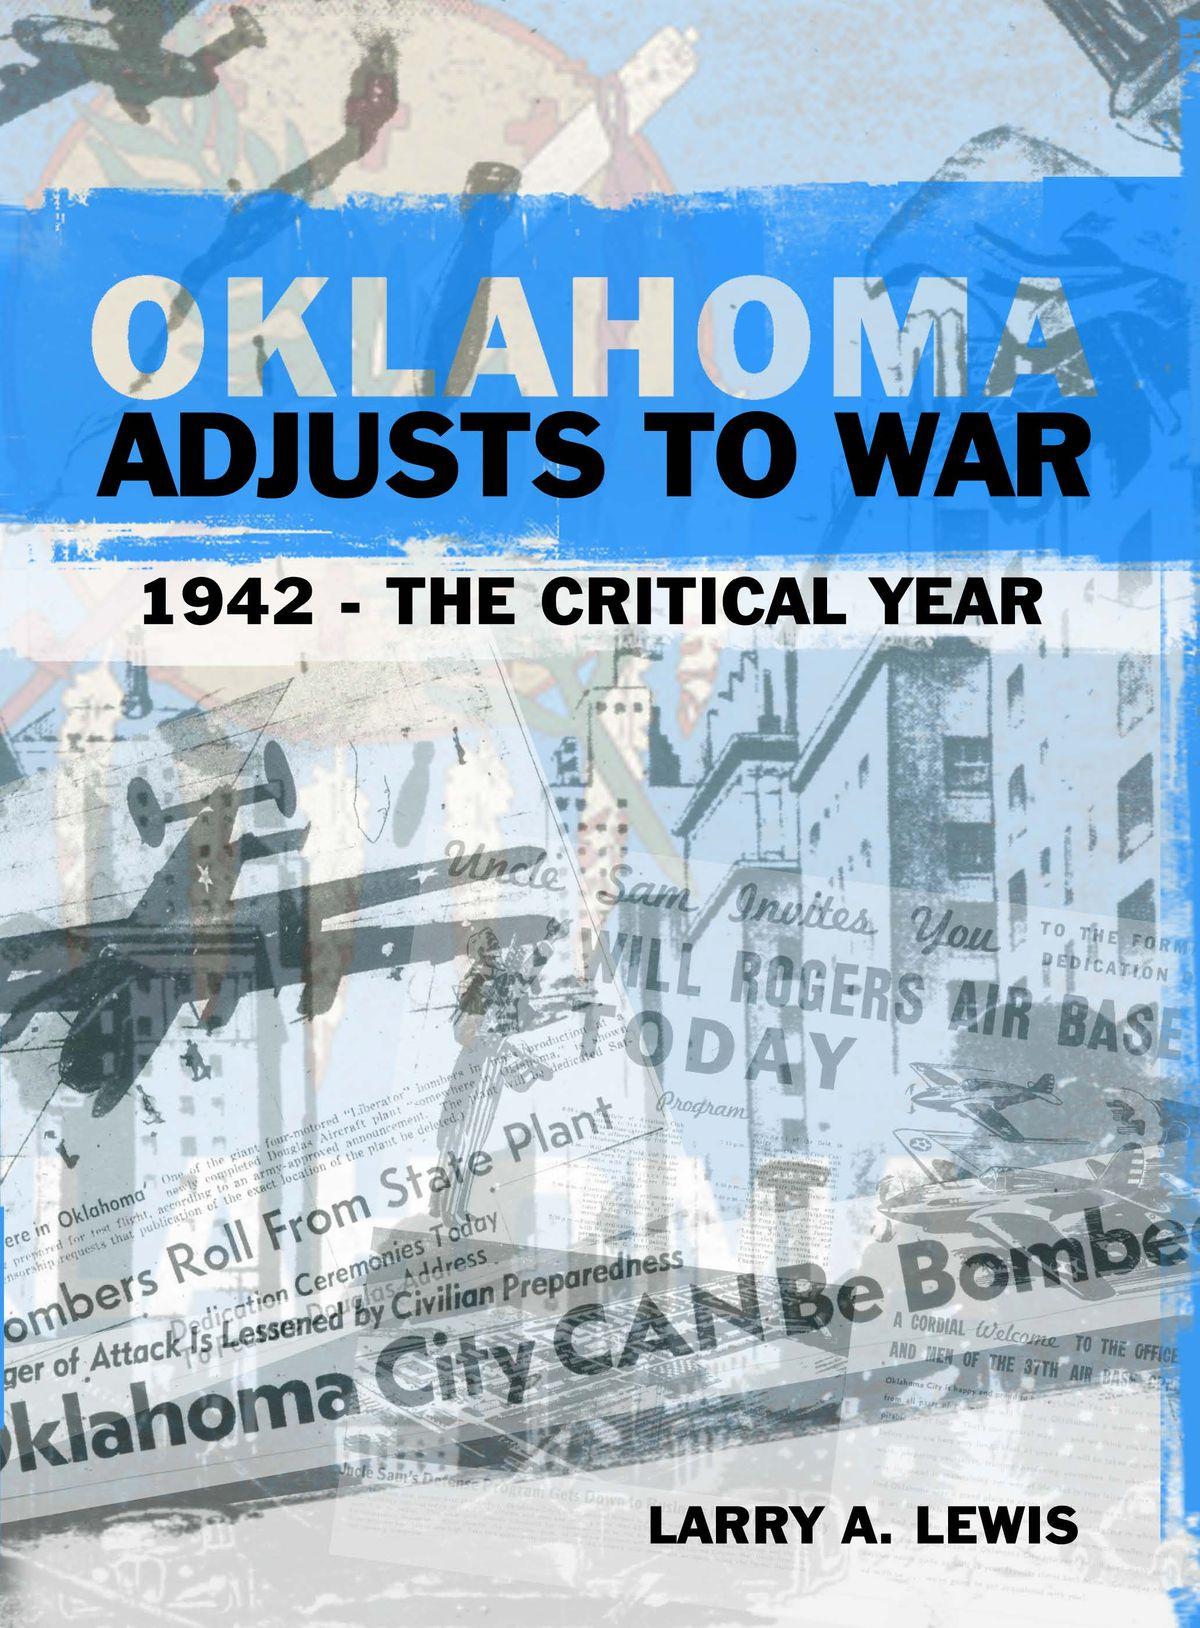 Oklahoma Adjusts to War Cover.jpg